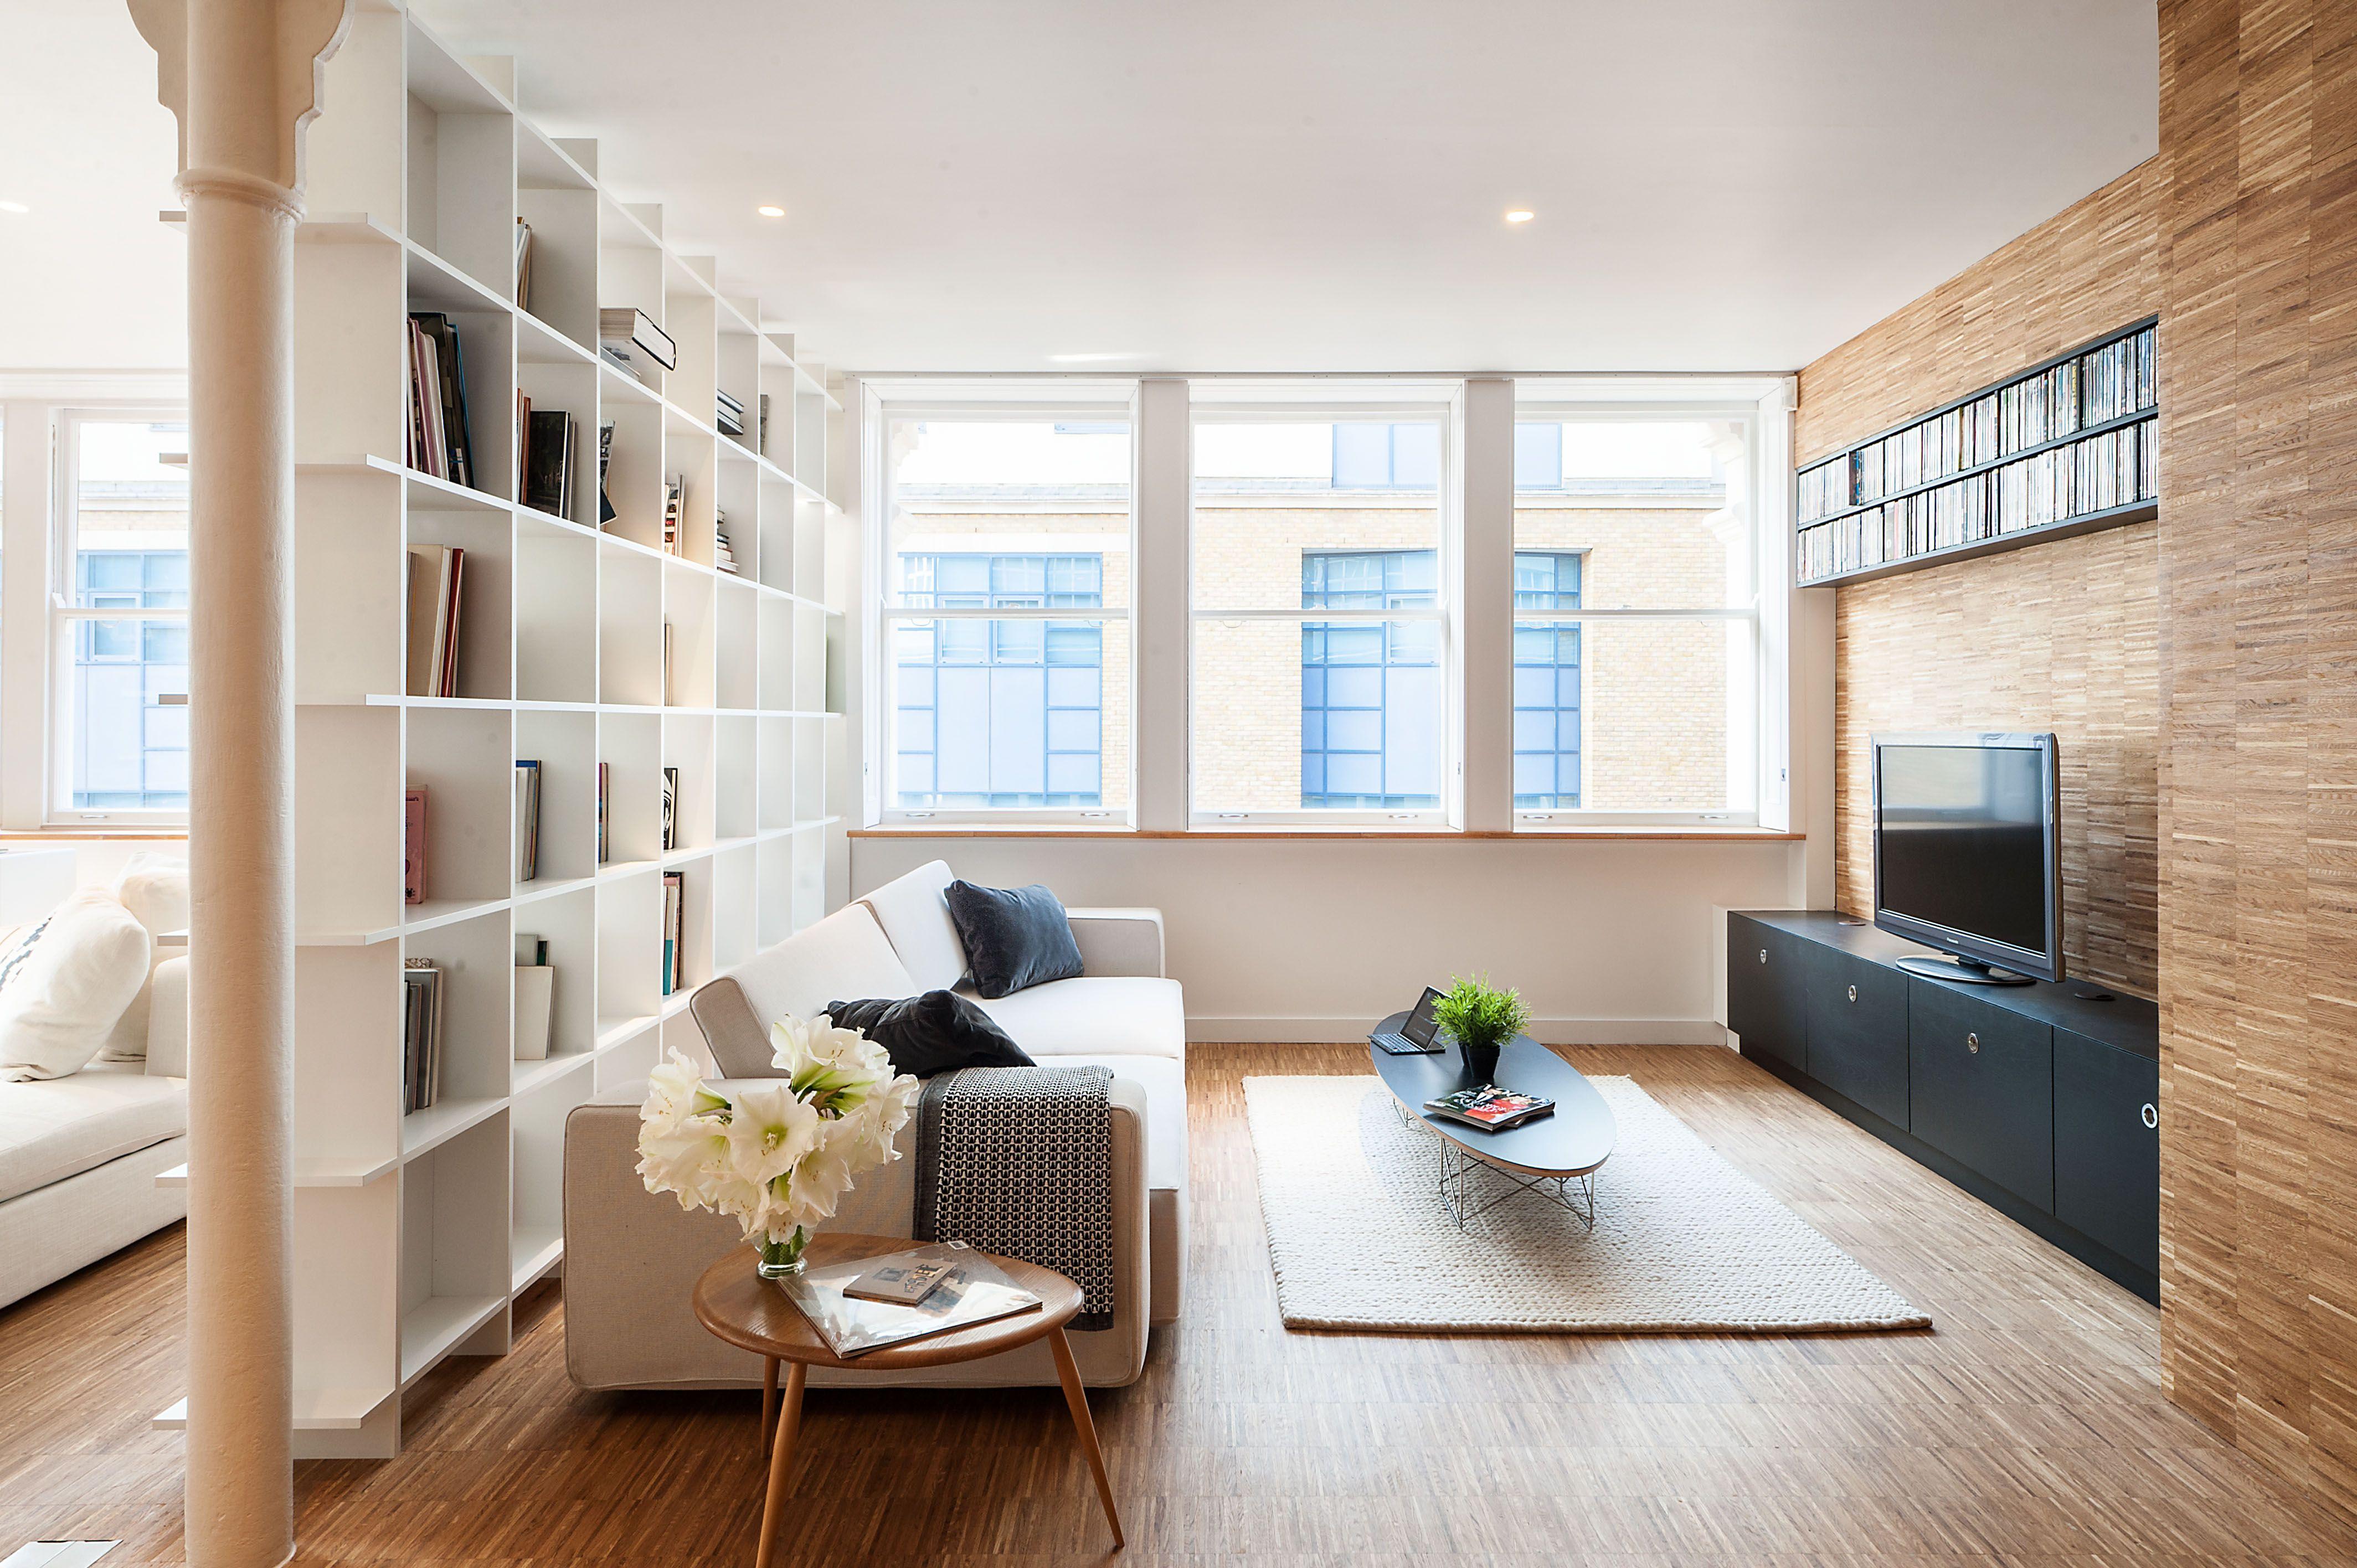 House window sunshade design  simarc property management ltd  simarc interior property